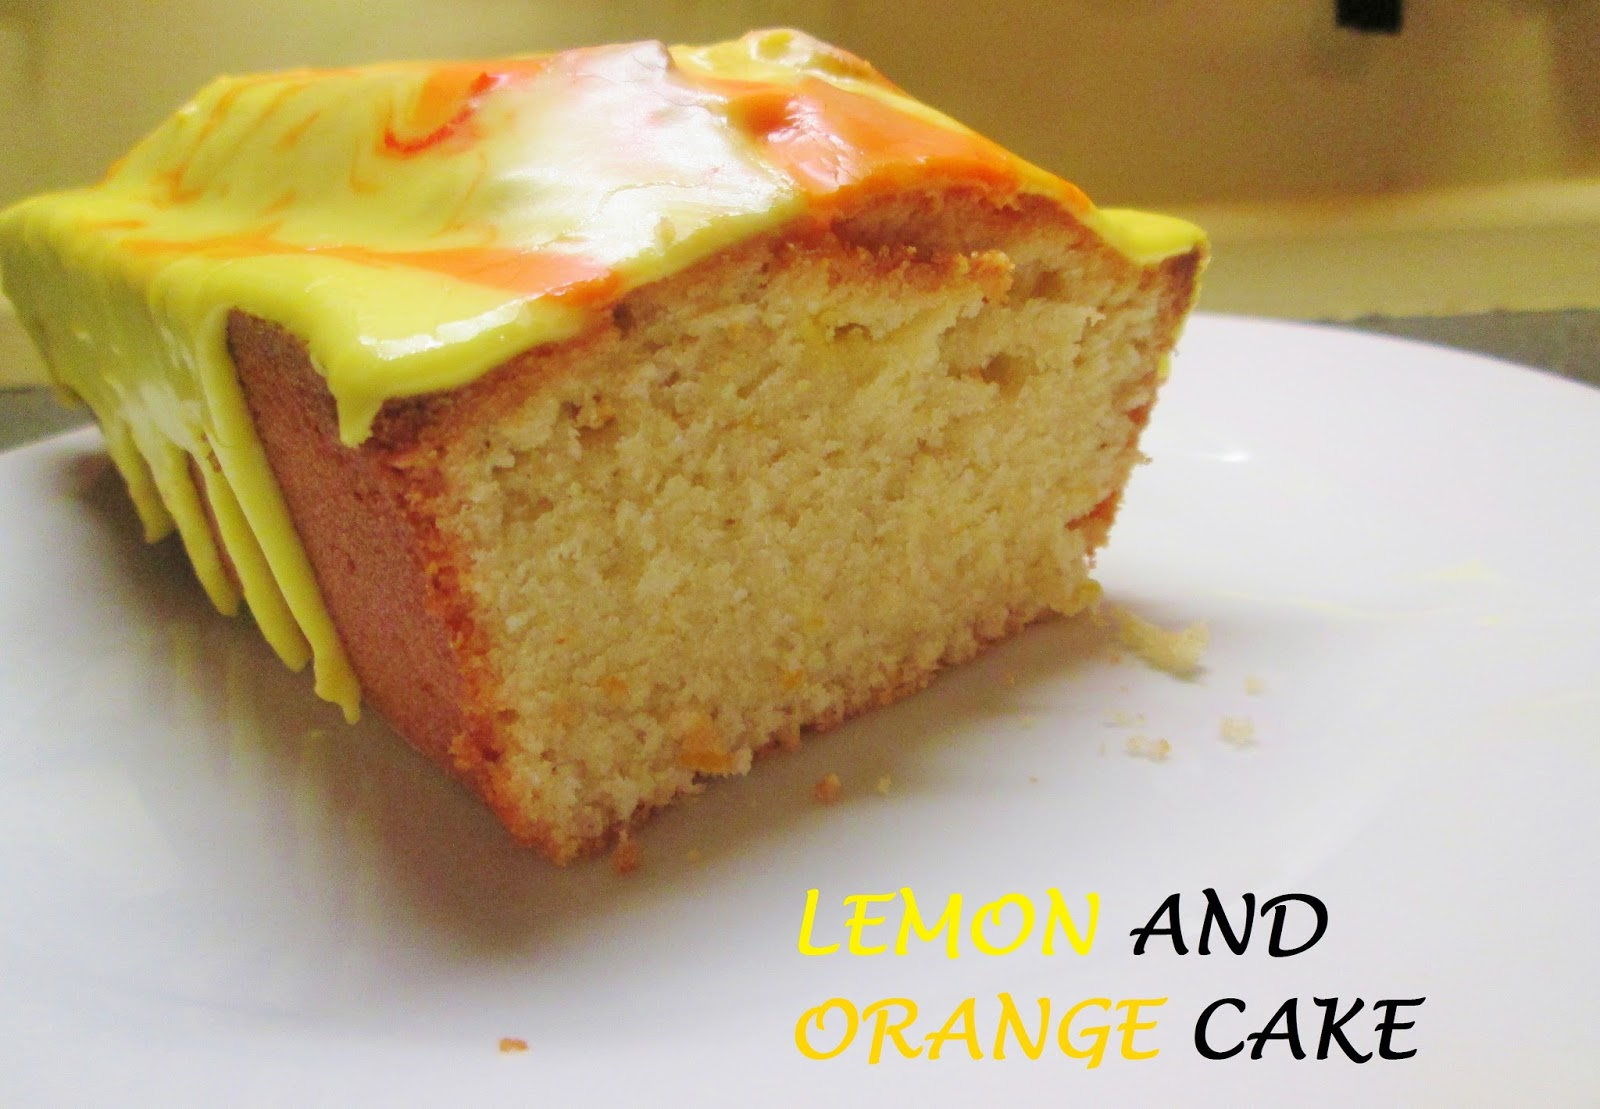 http://themessykitchenuk.blogspot.co.uk/2013/08/lemon-and-orange-cake.html